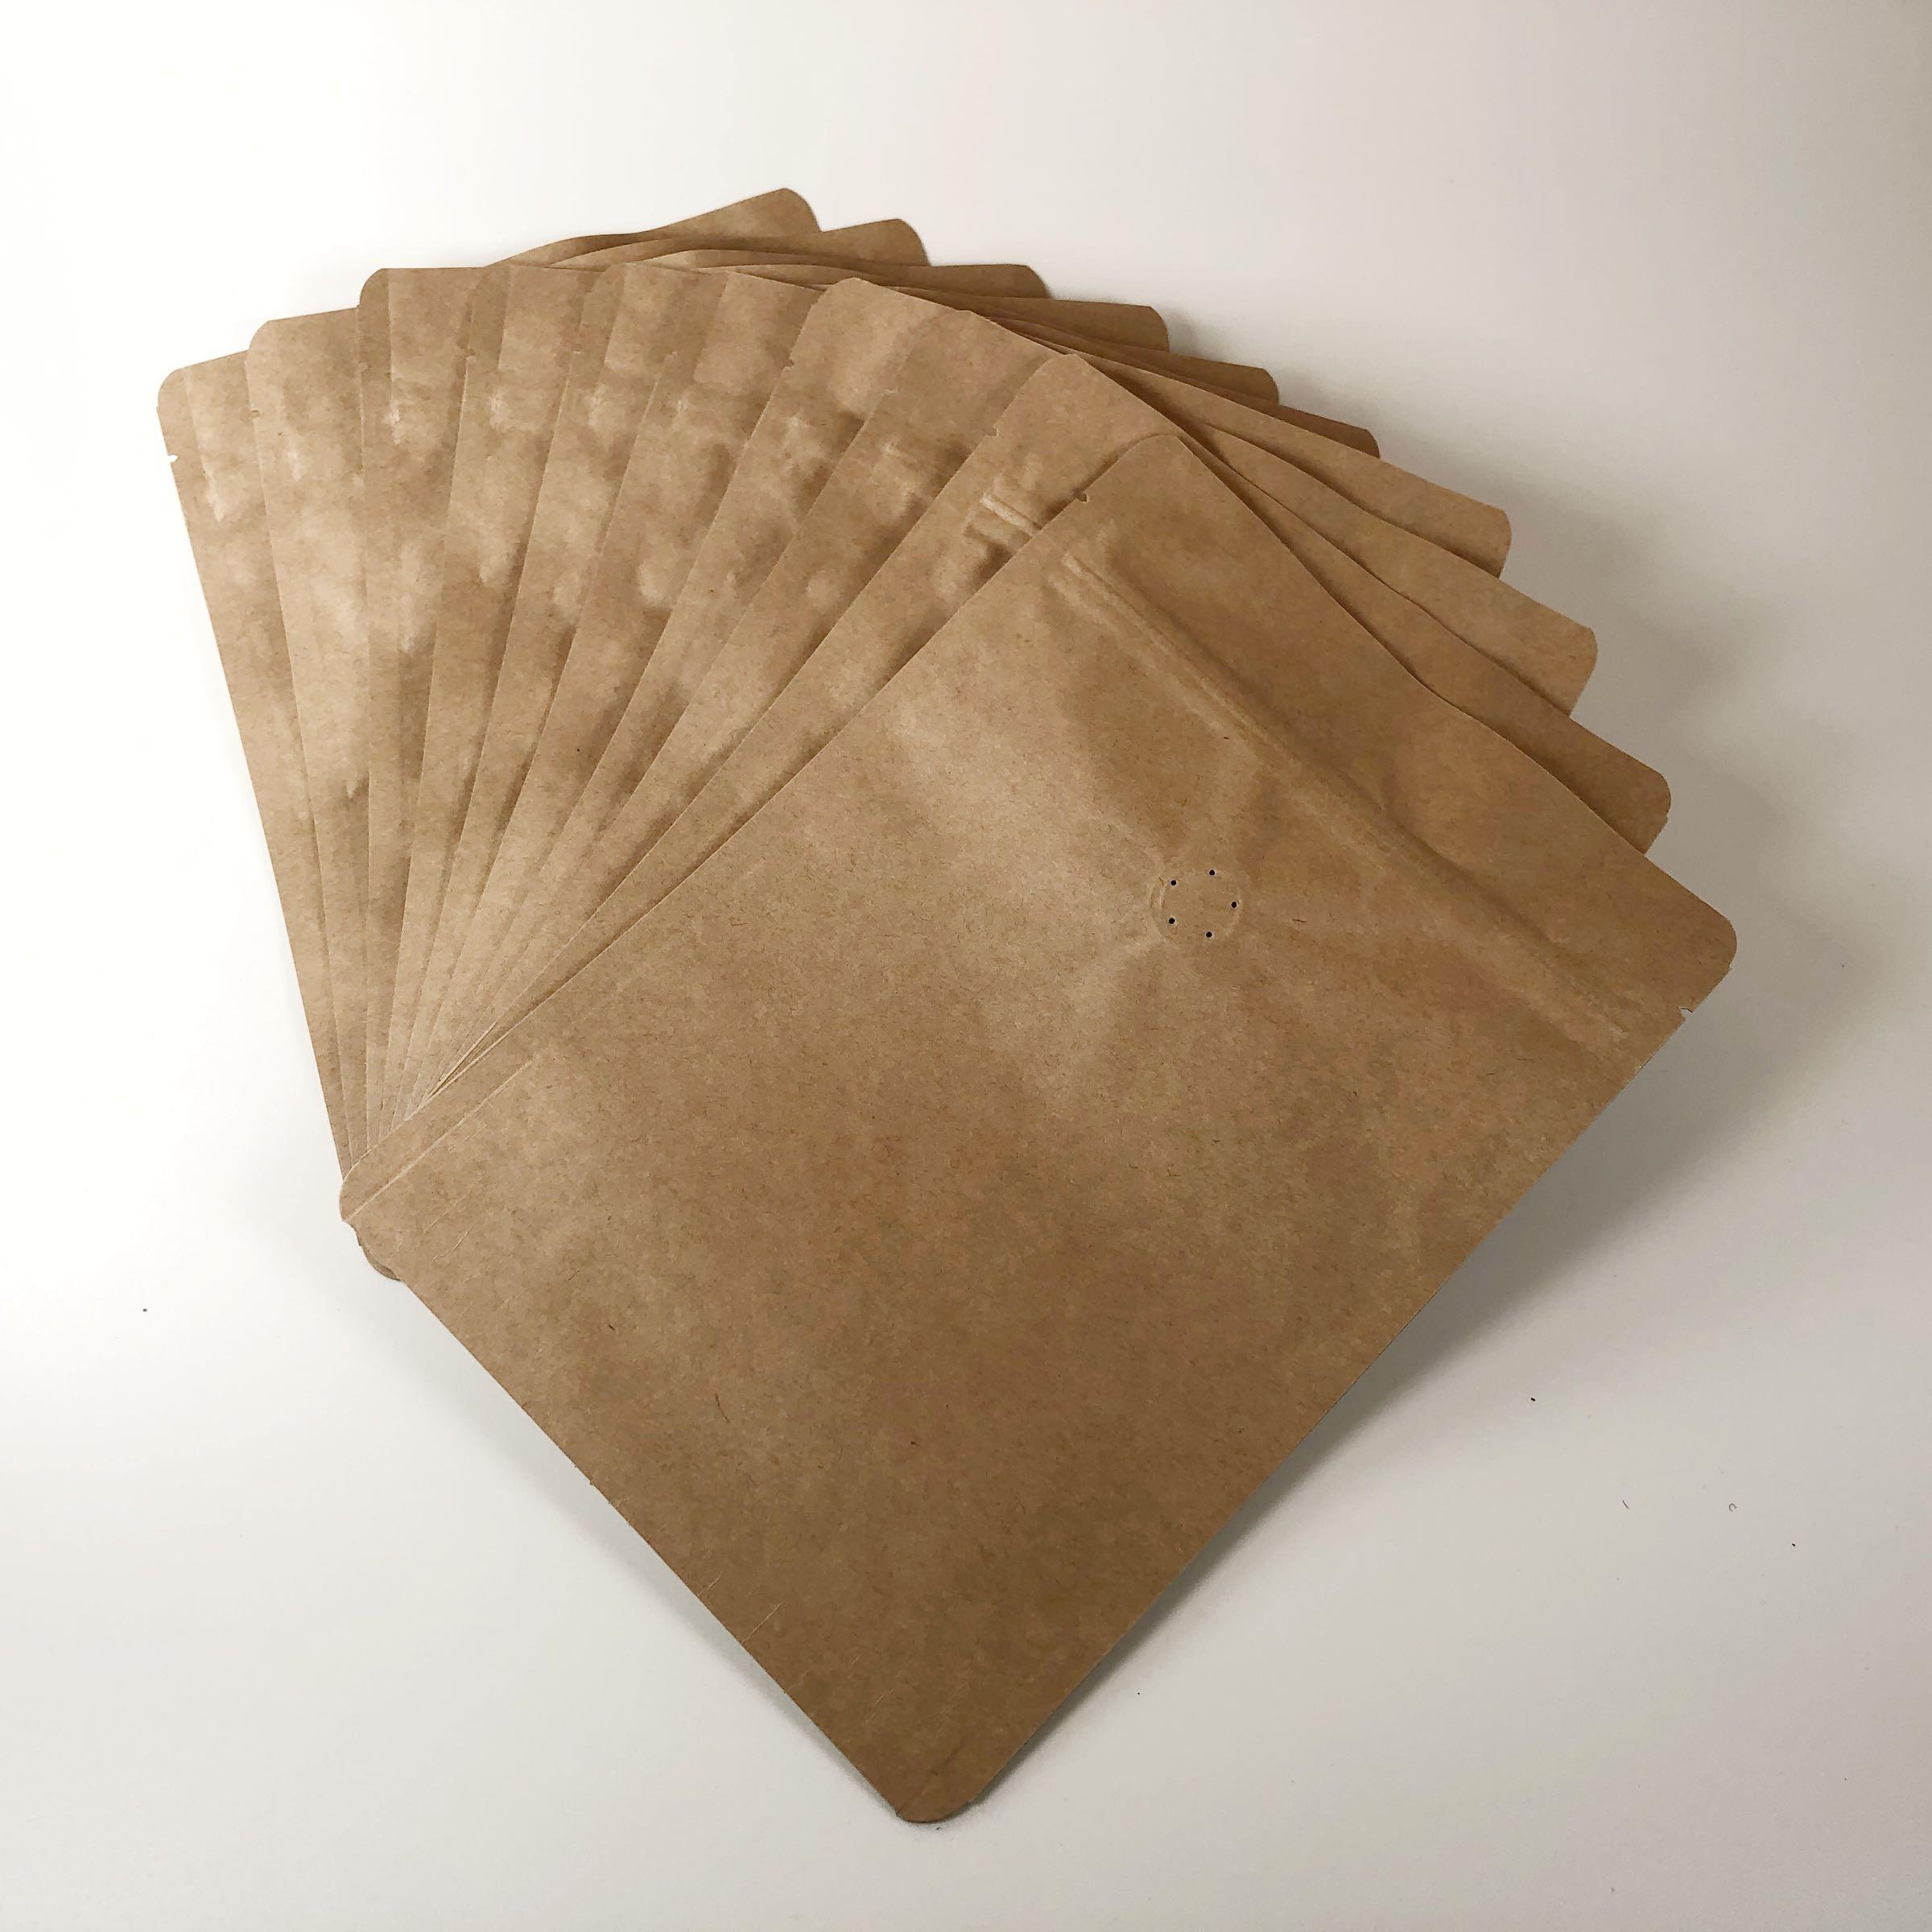 Kaffepåse 250 g 10-pack